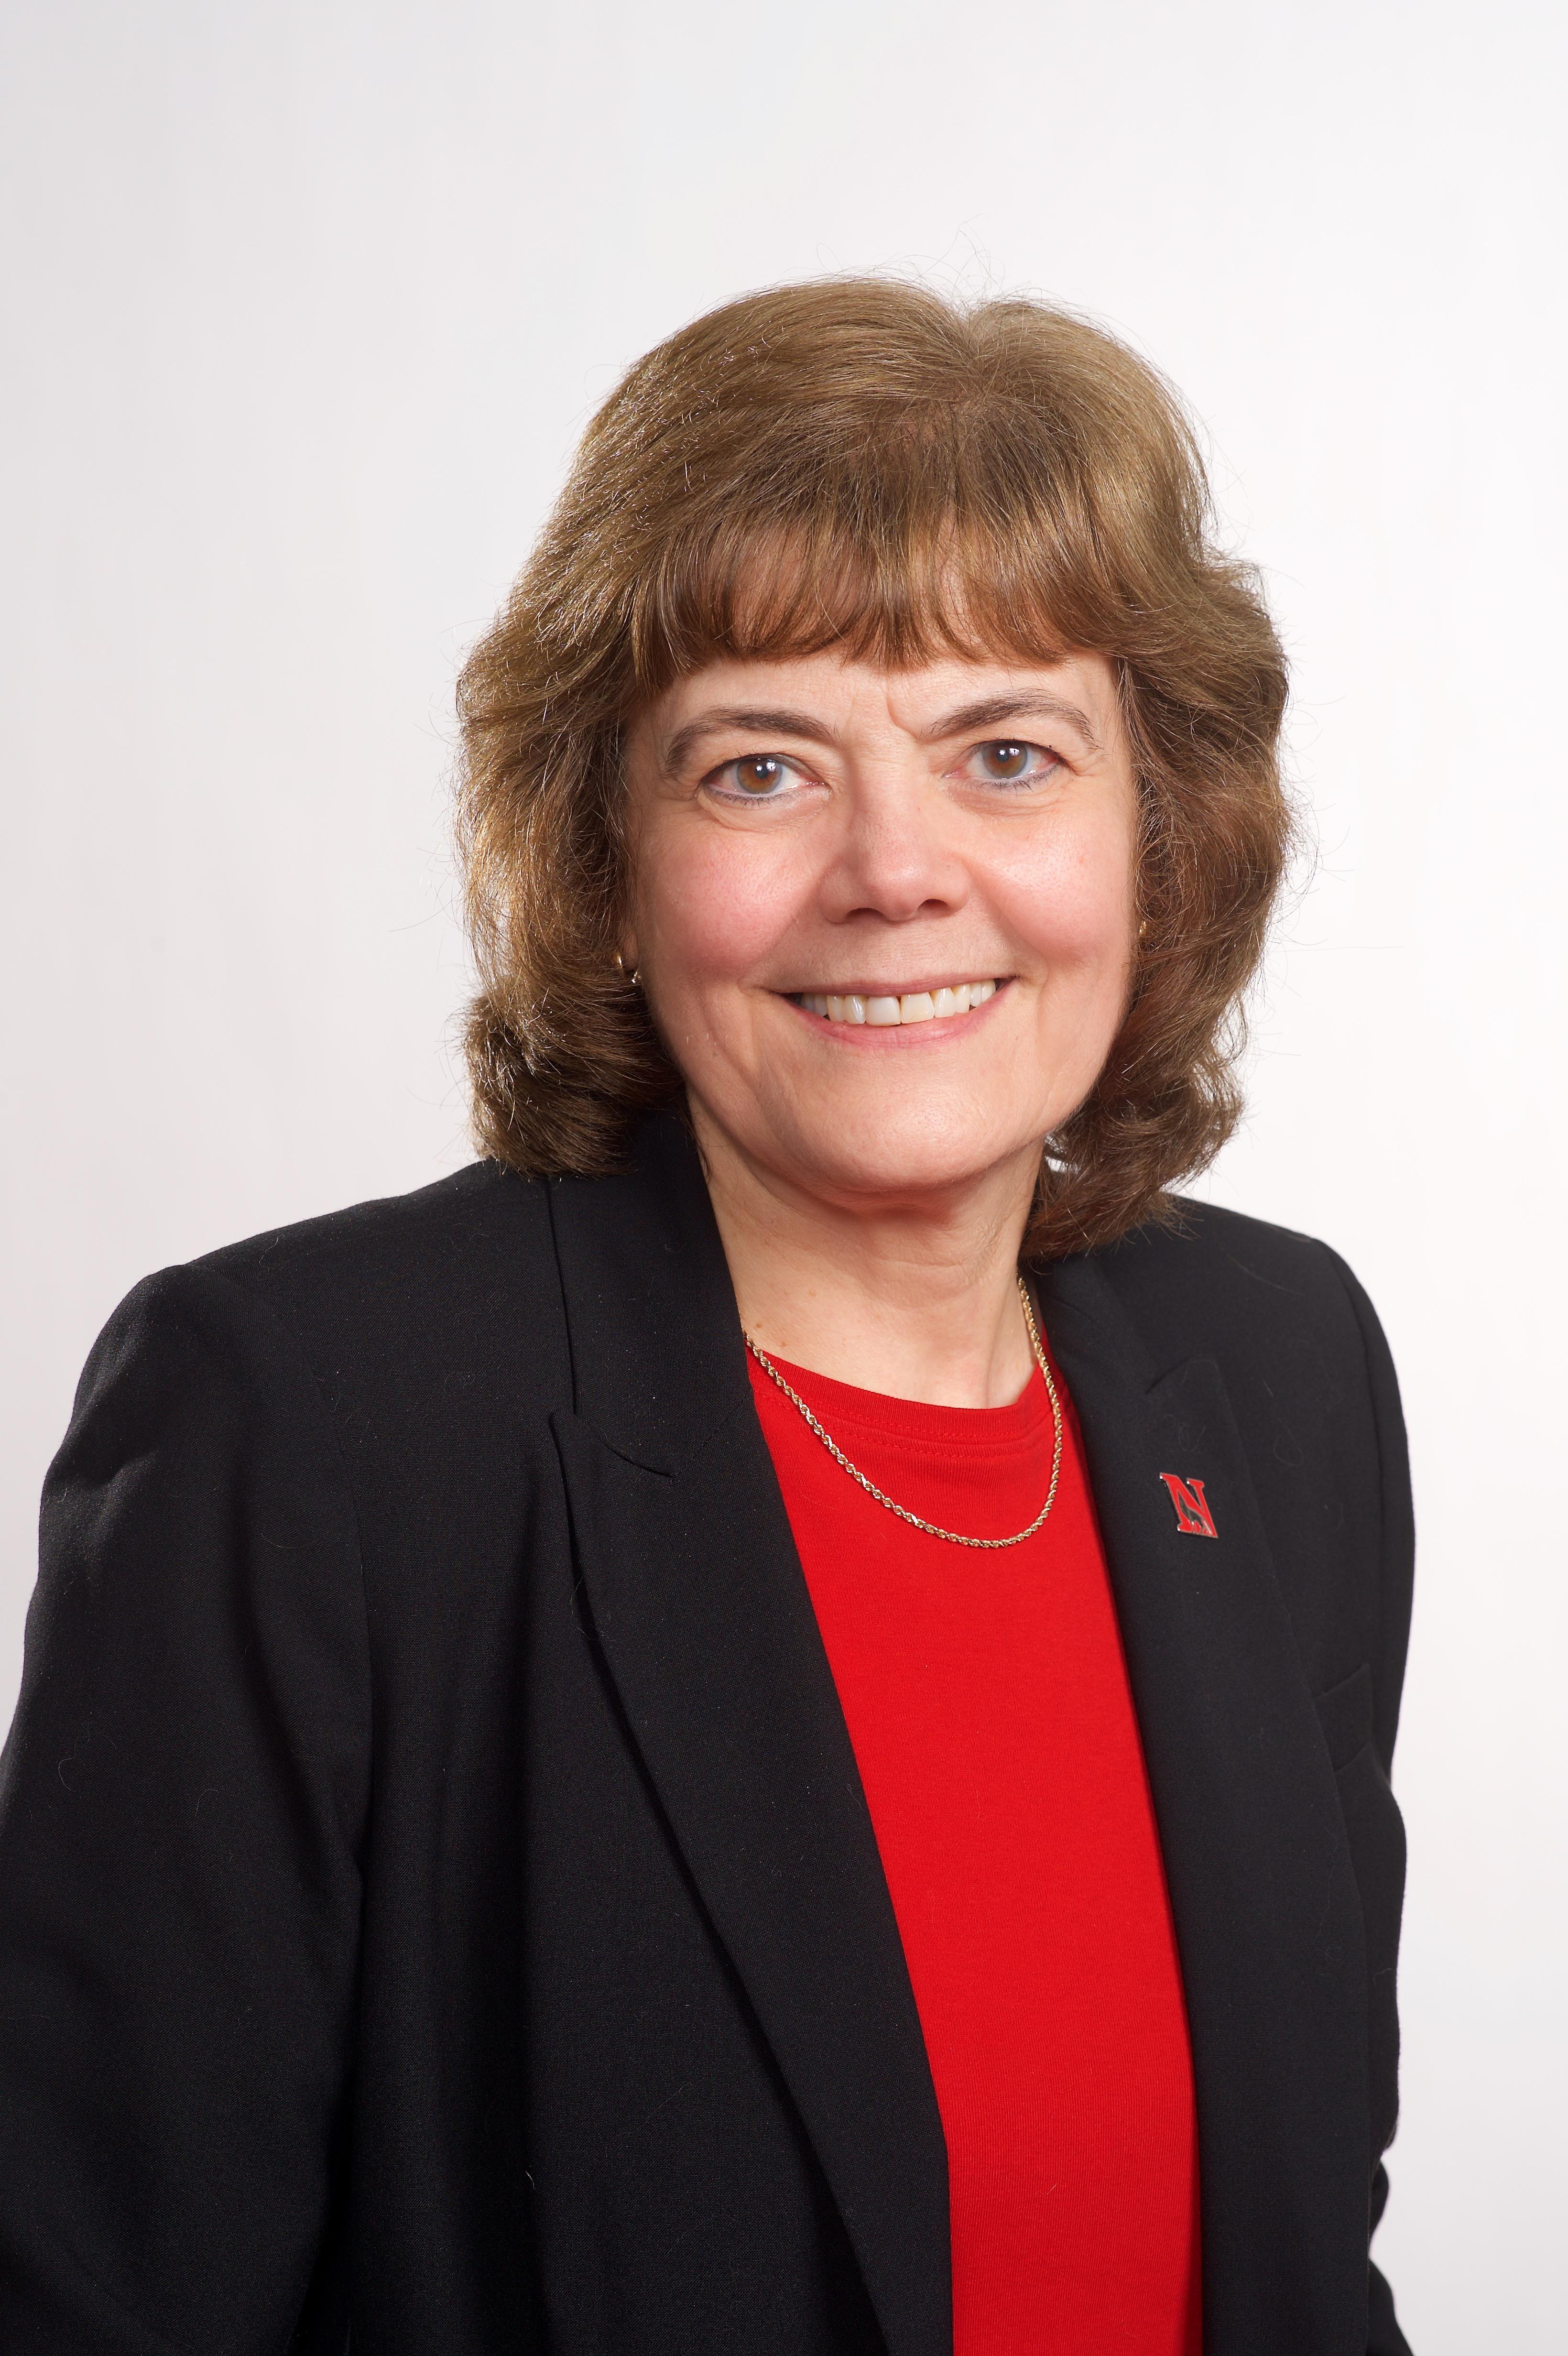 Kathy Worster